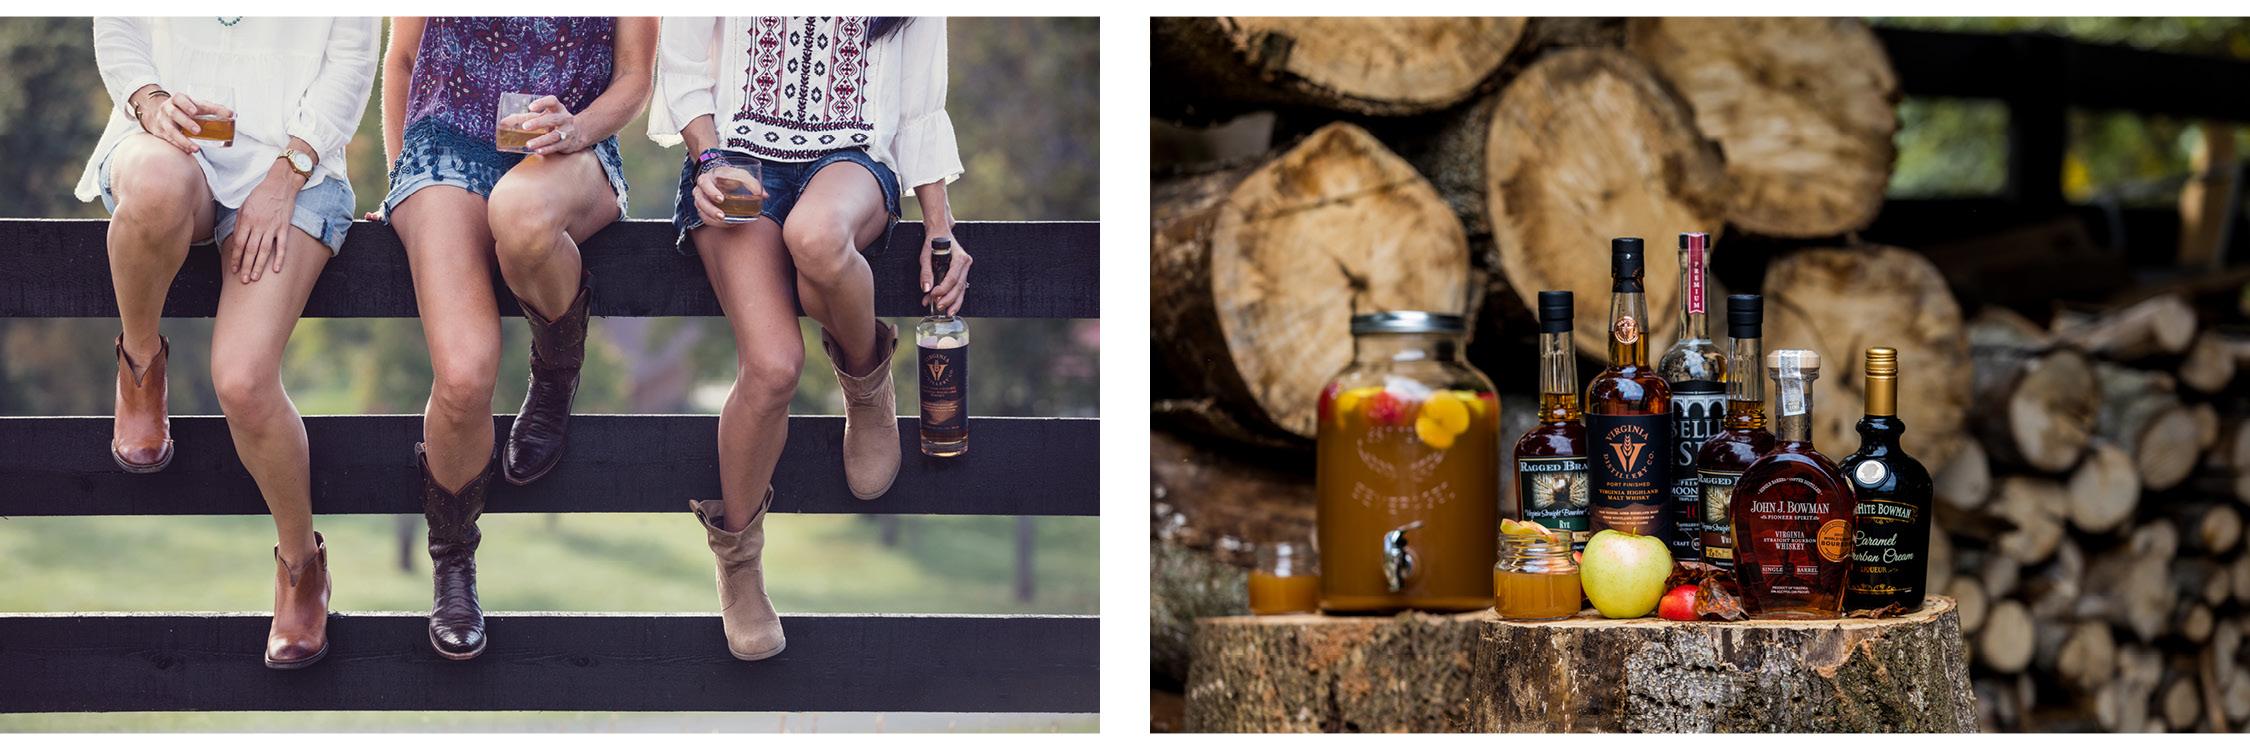 Image Credits: The Virginia Distillers Association / @vaspirits